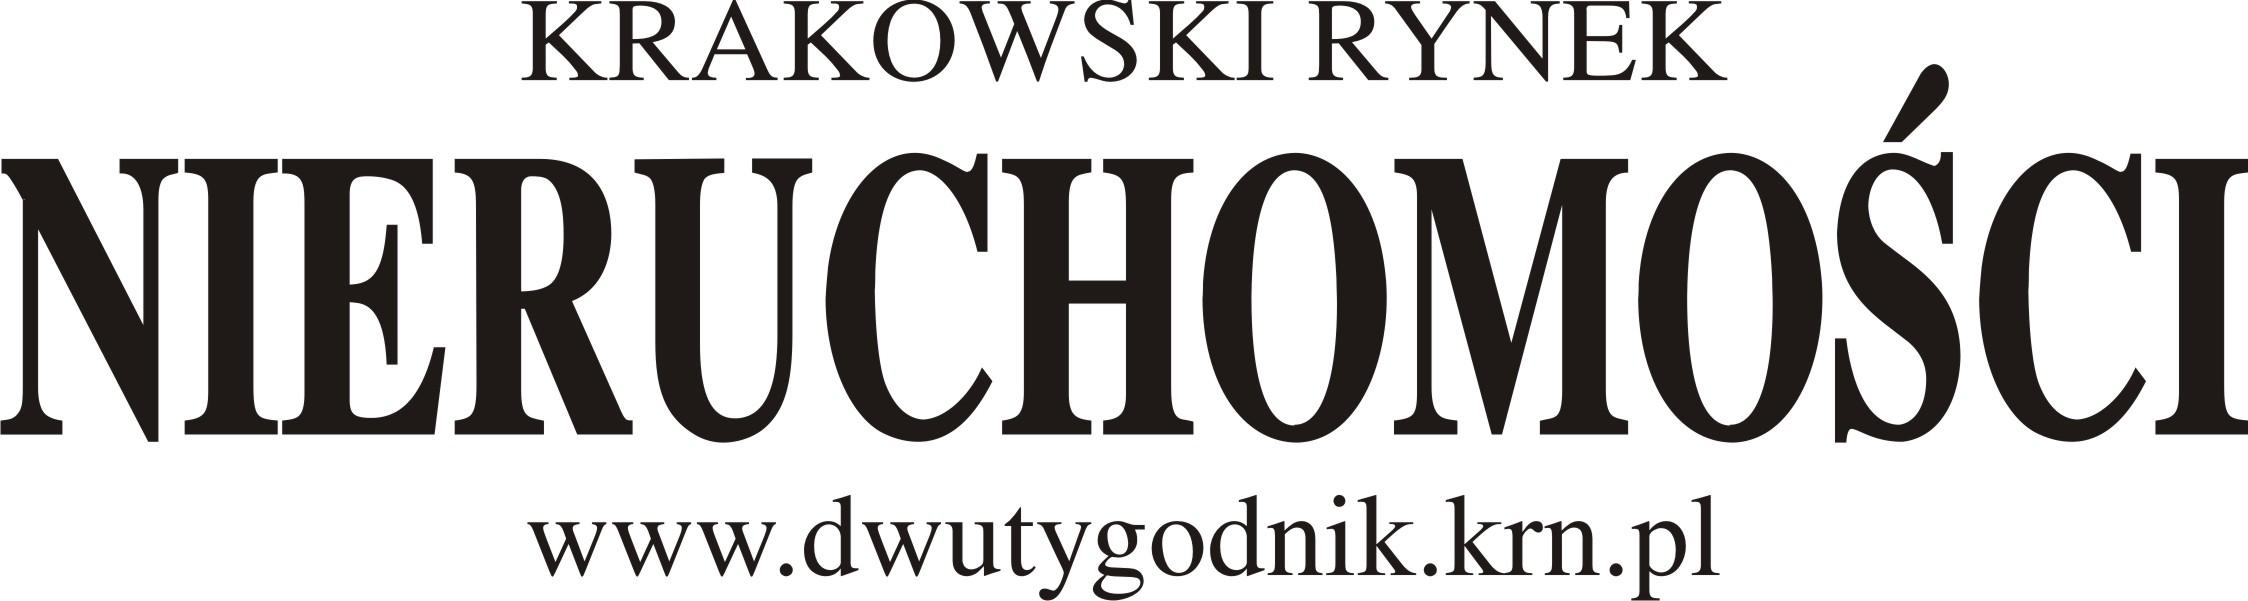 Krakowski Rynek Nieruchomości - Dwutygodnik